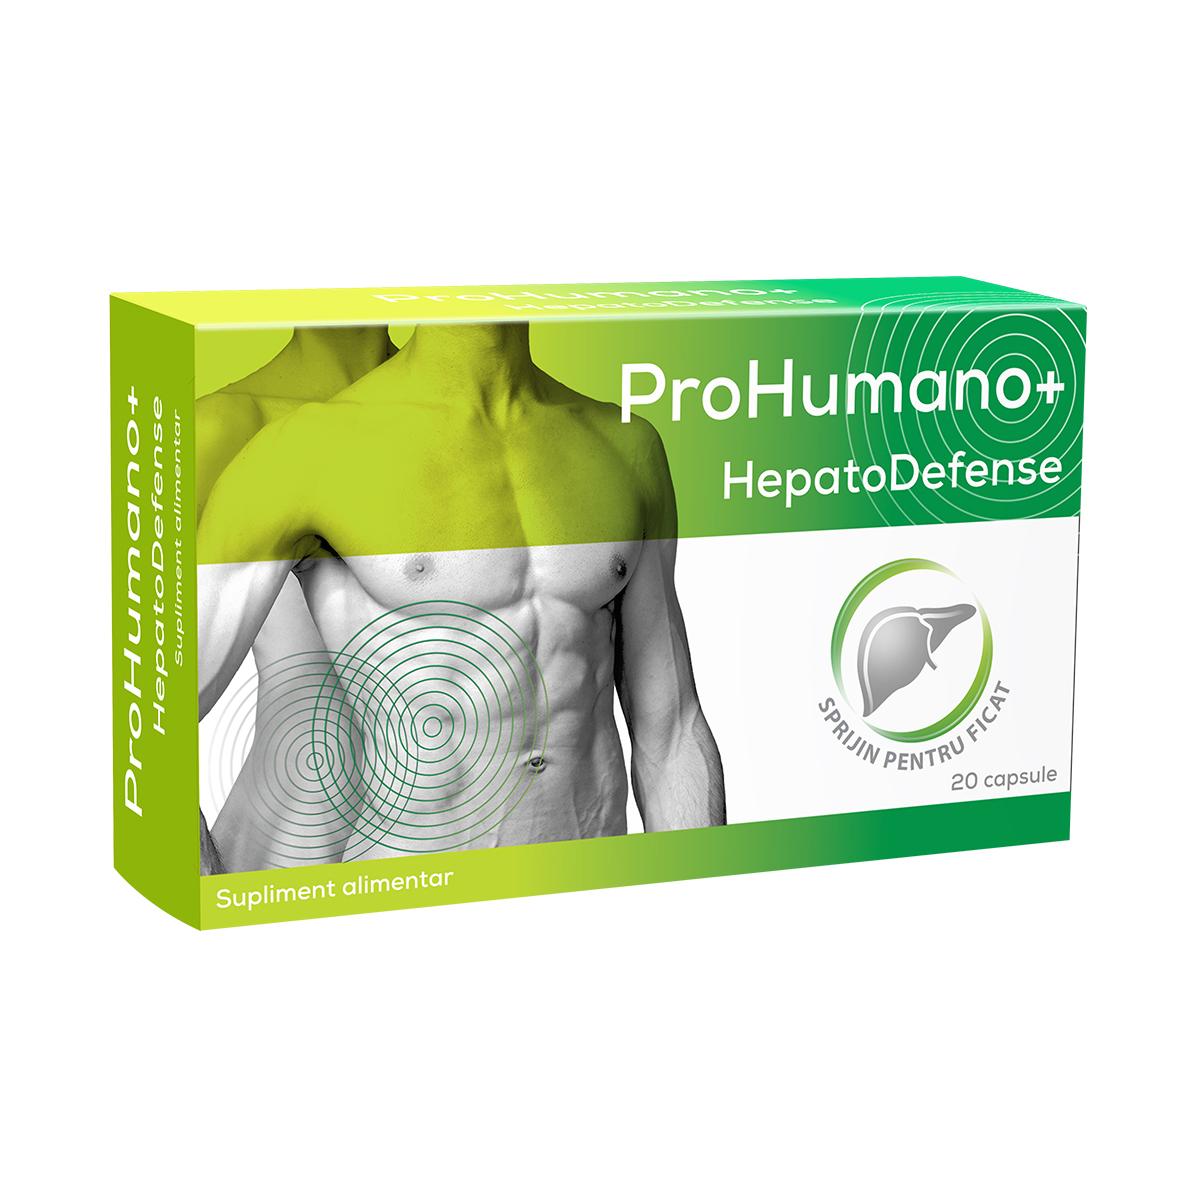 HepatoDefense ProHumano+, 20 capsule, Pharmalinea